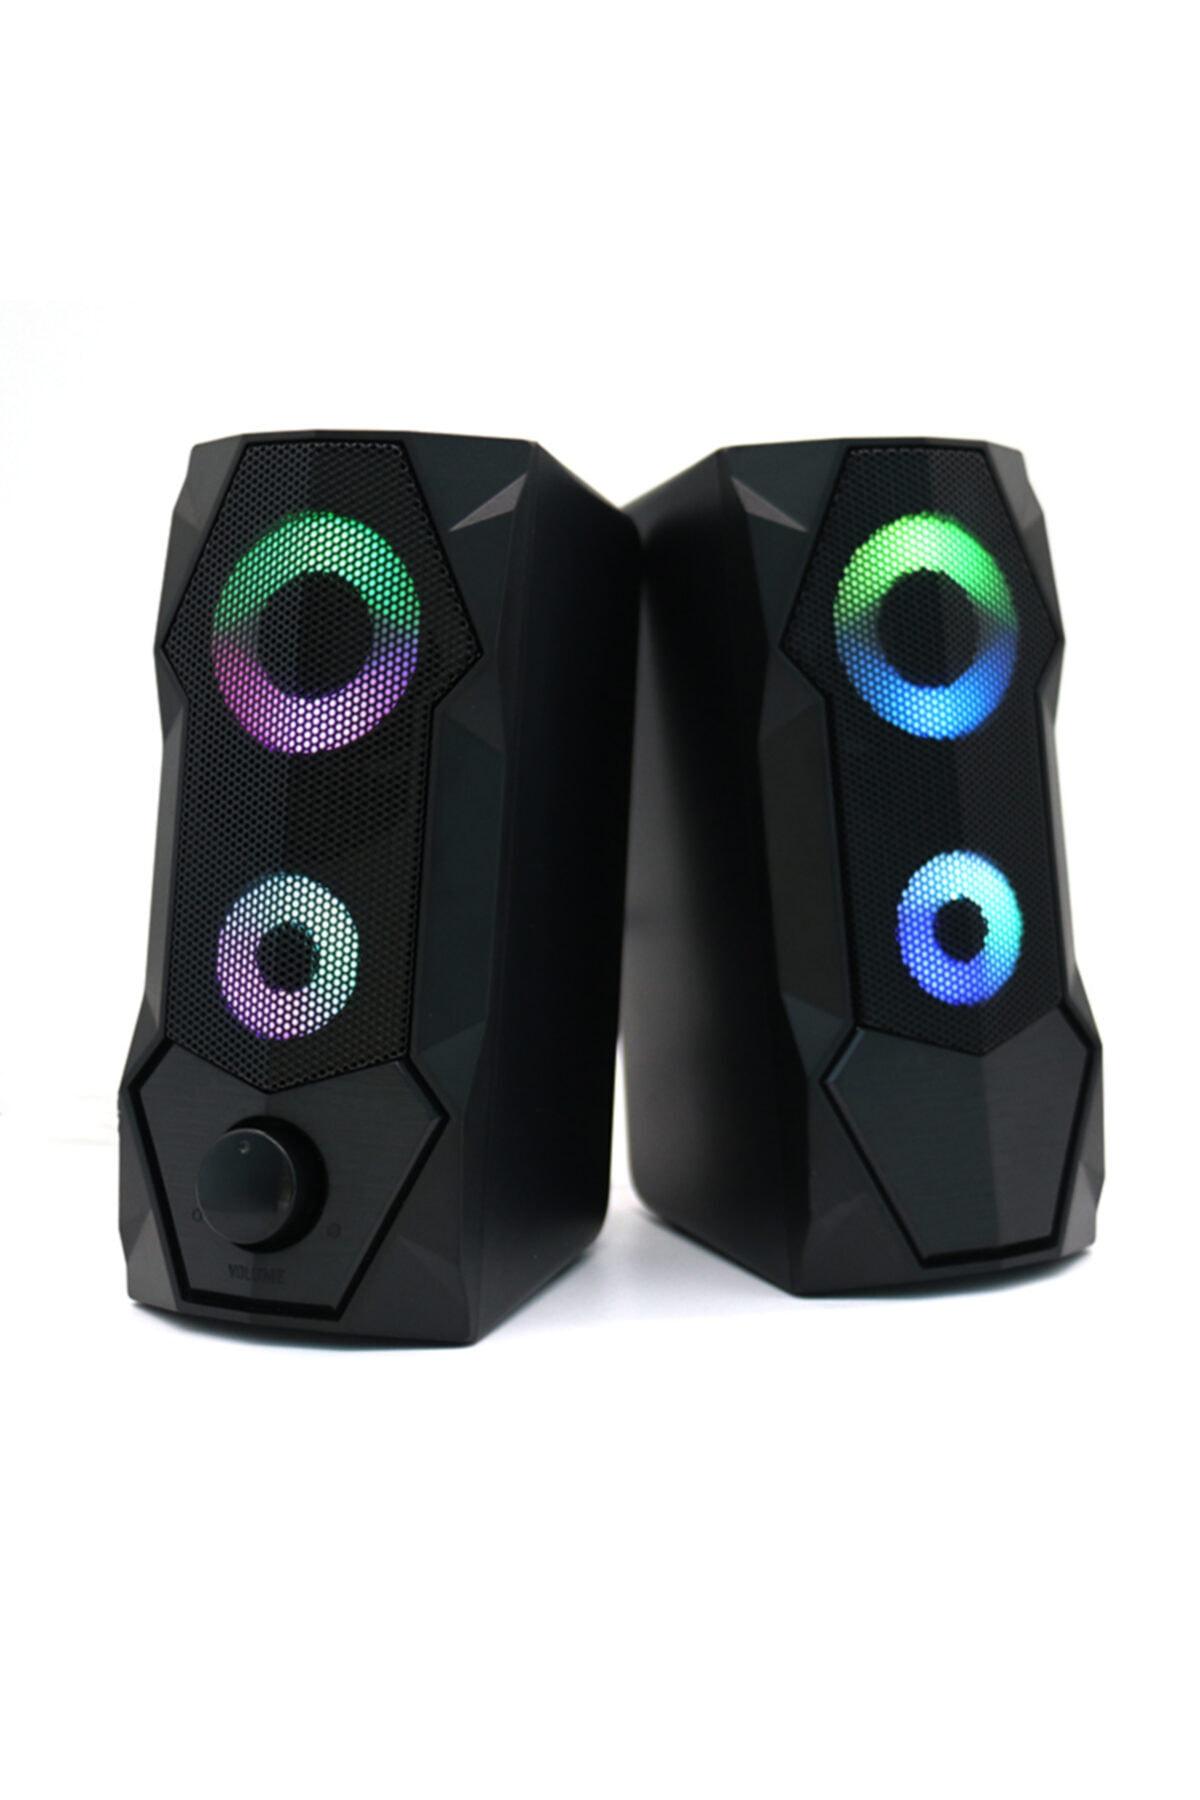 Bilgisayar Hoparlörleri Rgb Işıklı 2.0 Usb Oyun Stereo Kablolu Pc Hoparlör 3.5mm Aux Girişi